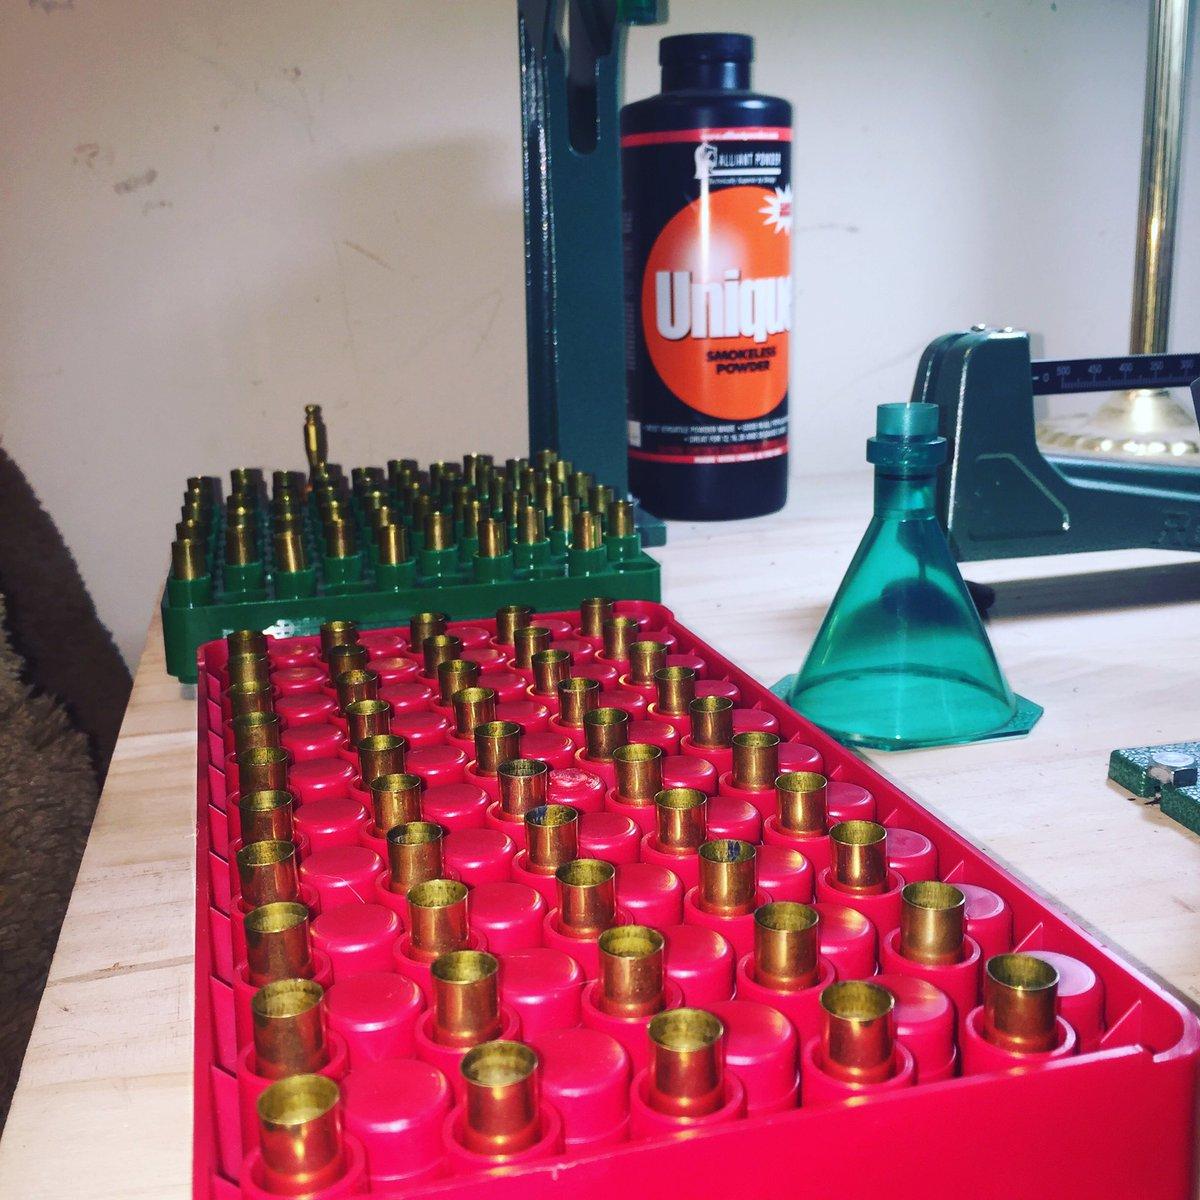 Sunday fun day reloading night. #reloading #bullets #rcbs @reloading2ammo #gun #ammo #uniquepowder #9mm #range #shooting <br>http://pic.twitter.com/N4DEcJ1b1o